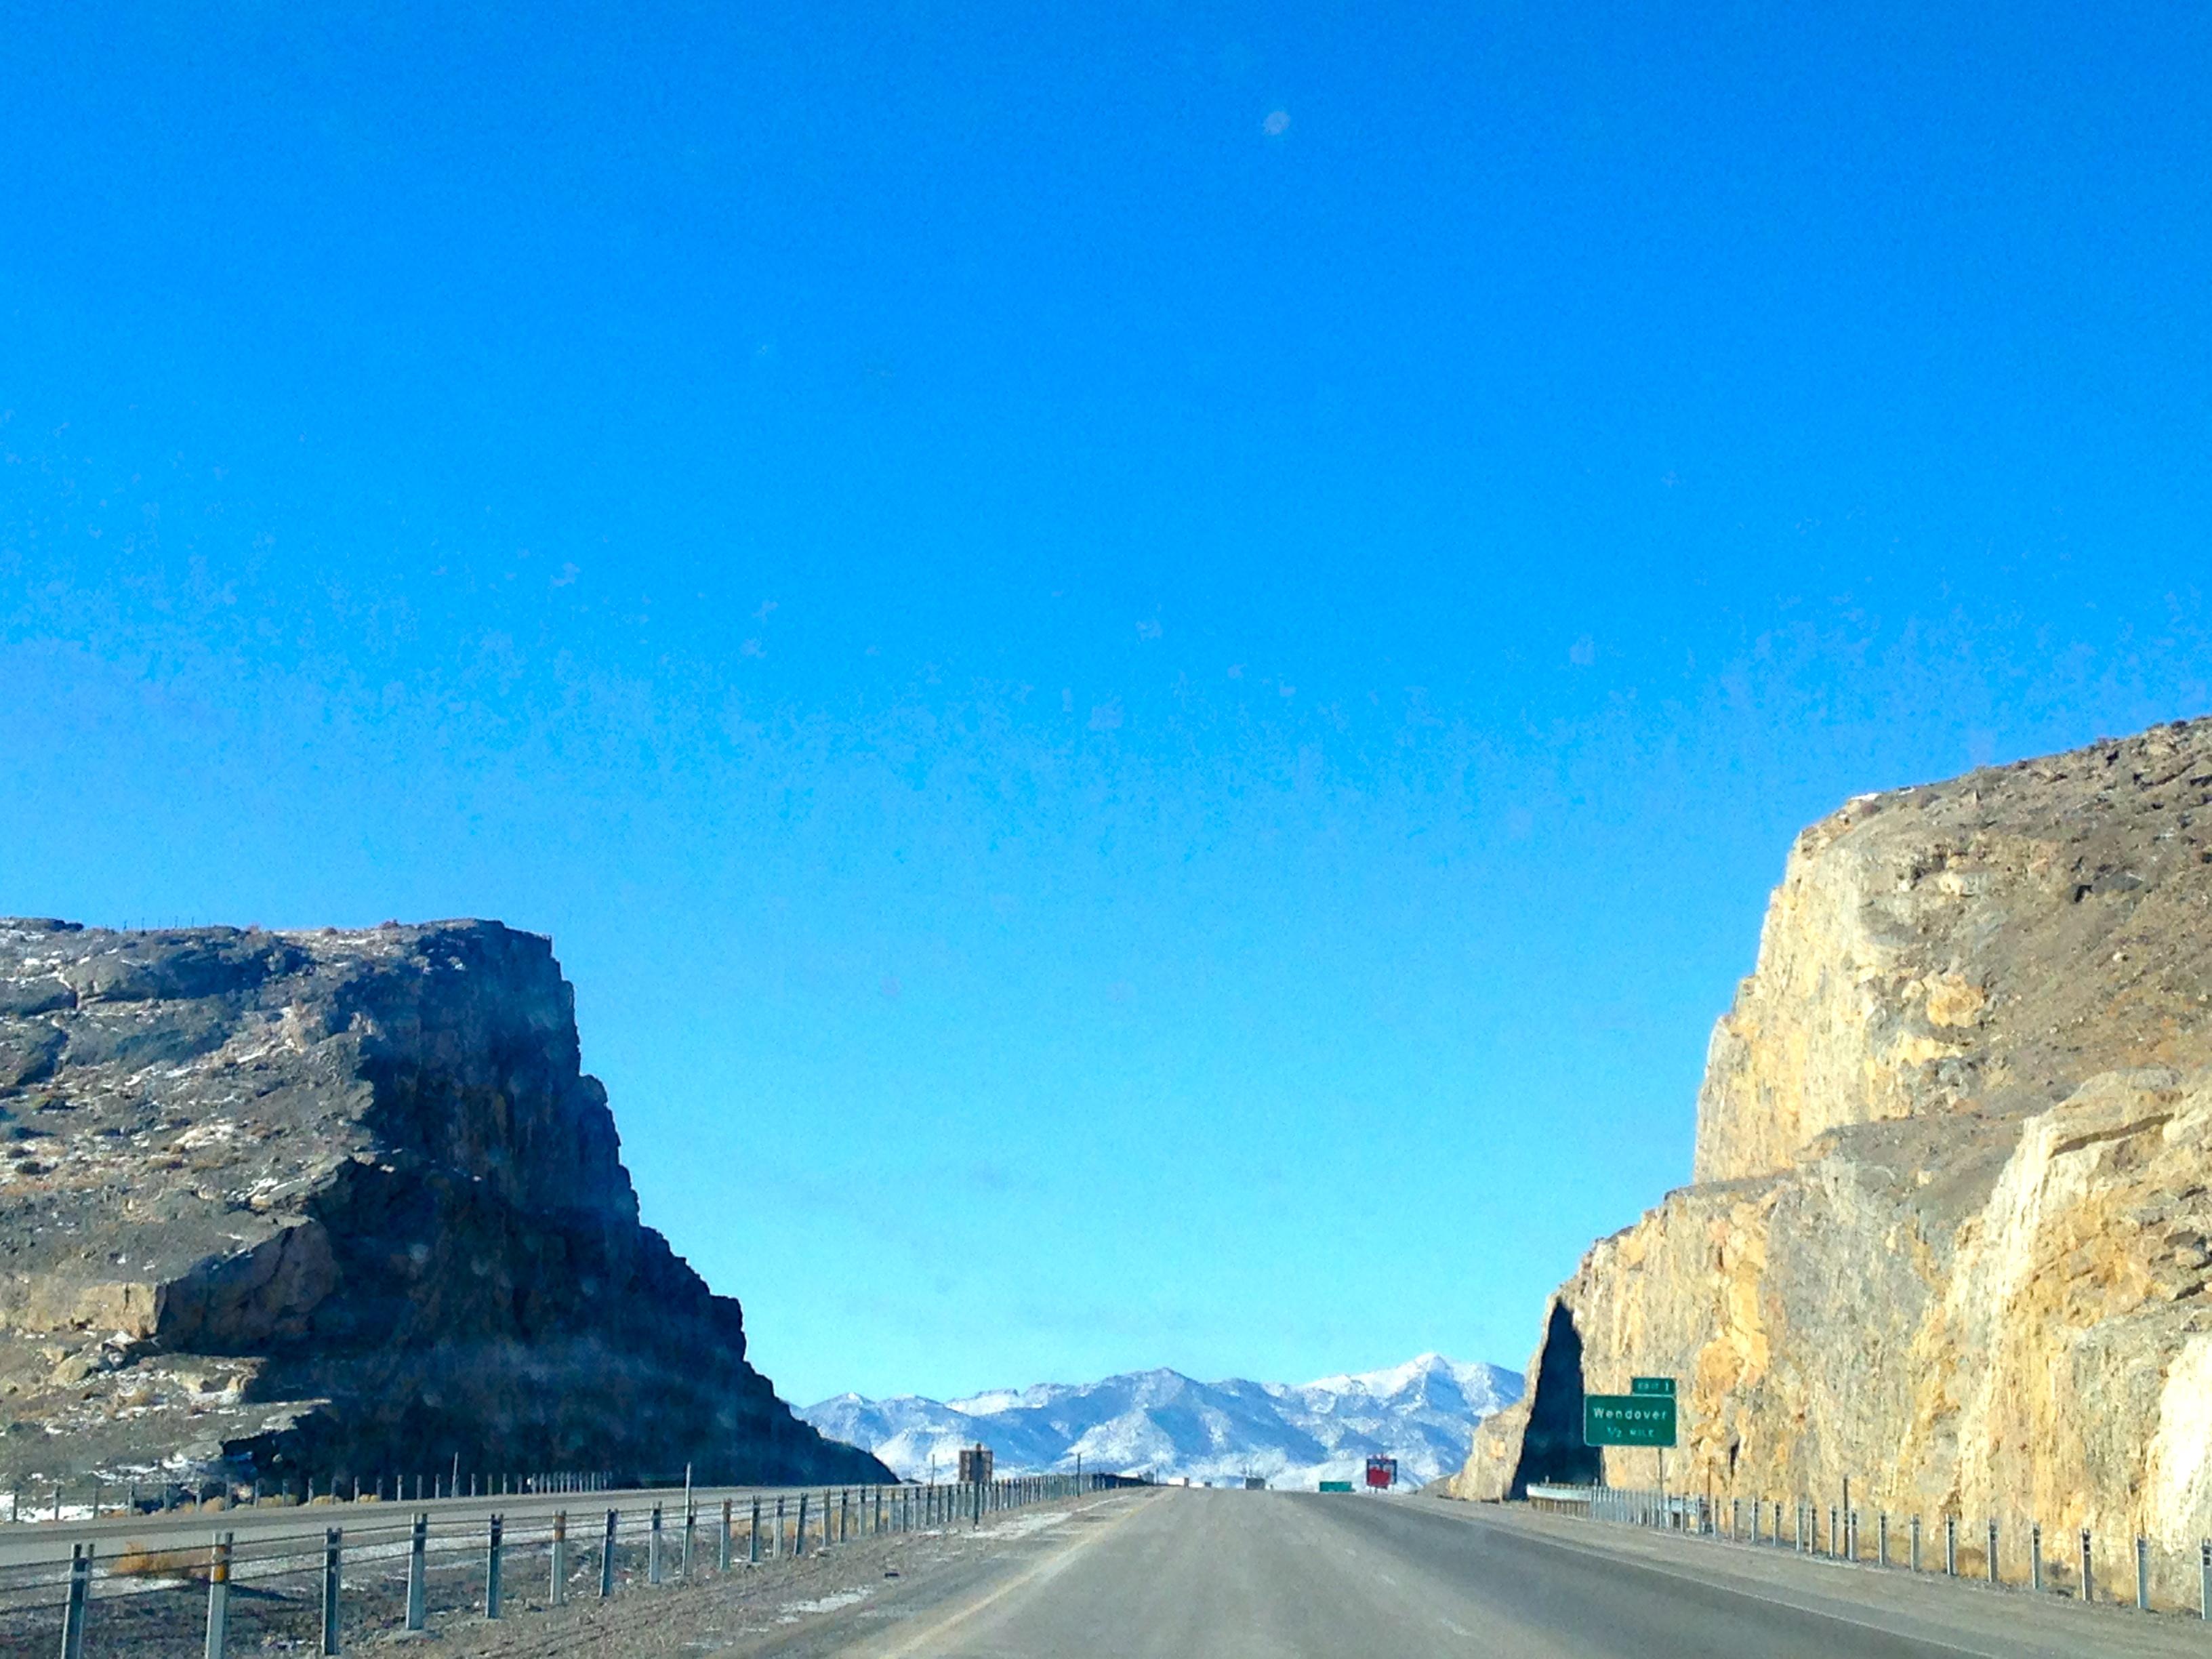 Entering Nevada